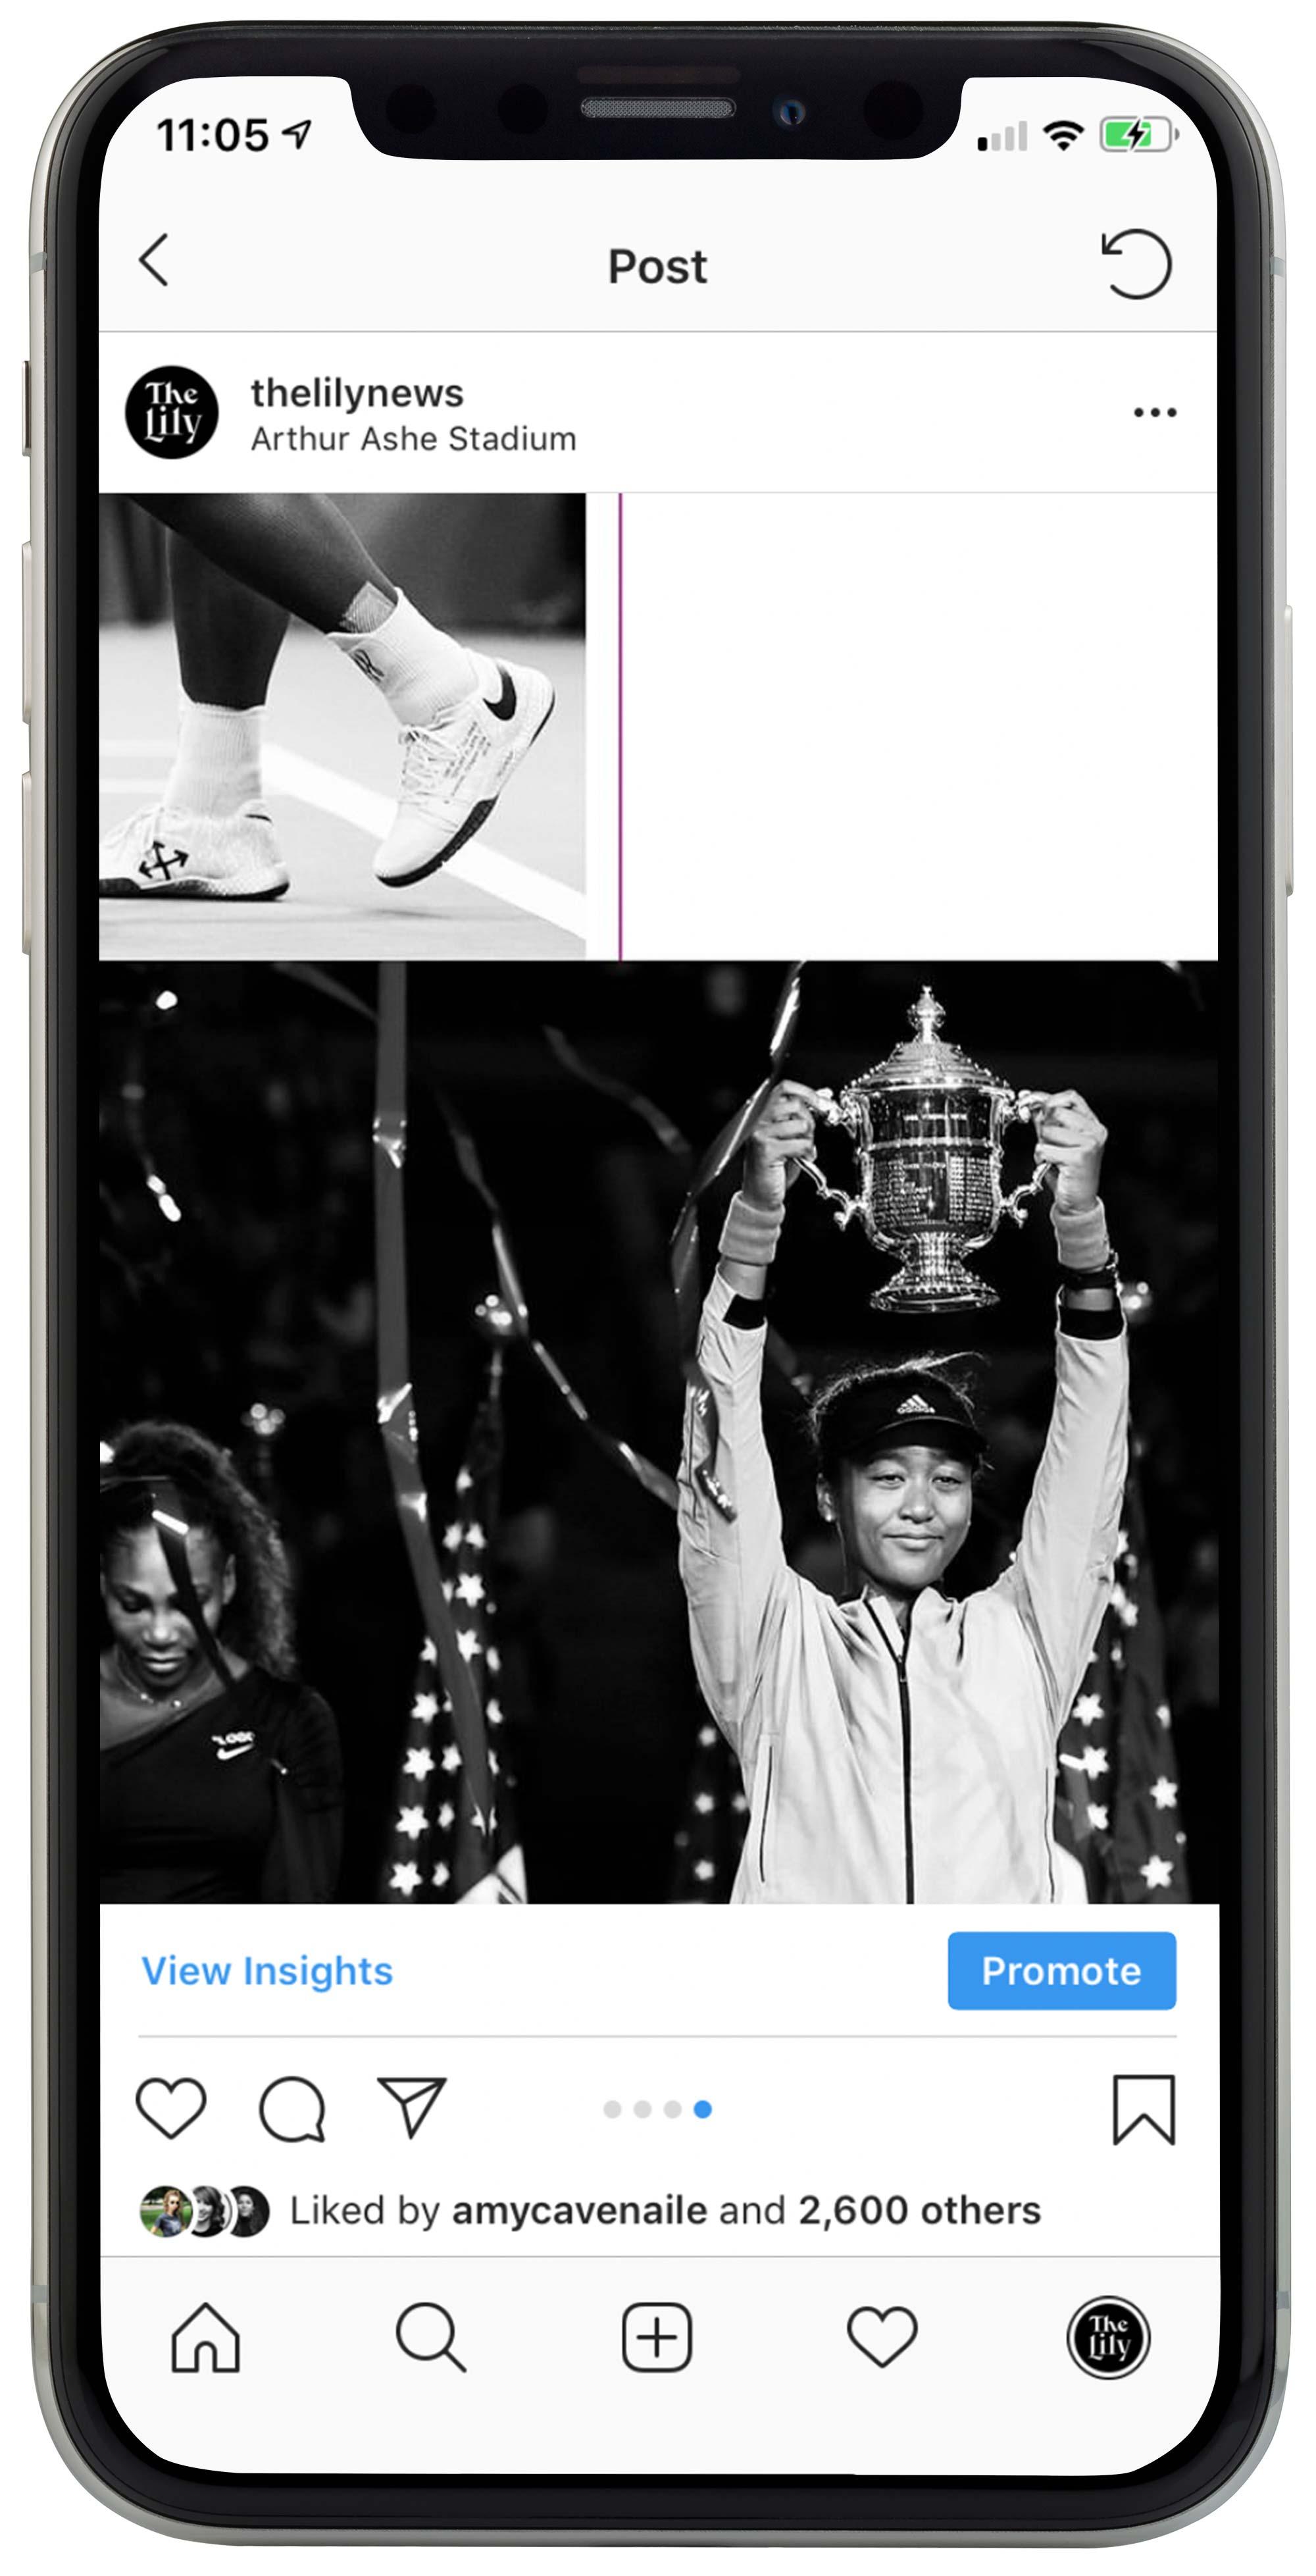 IGProper-Serena04.jpg